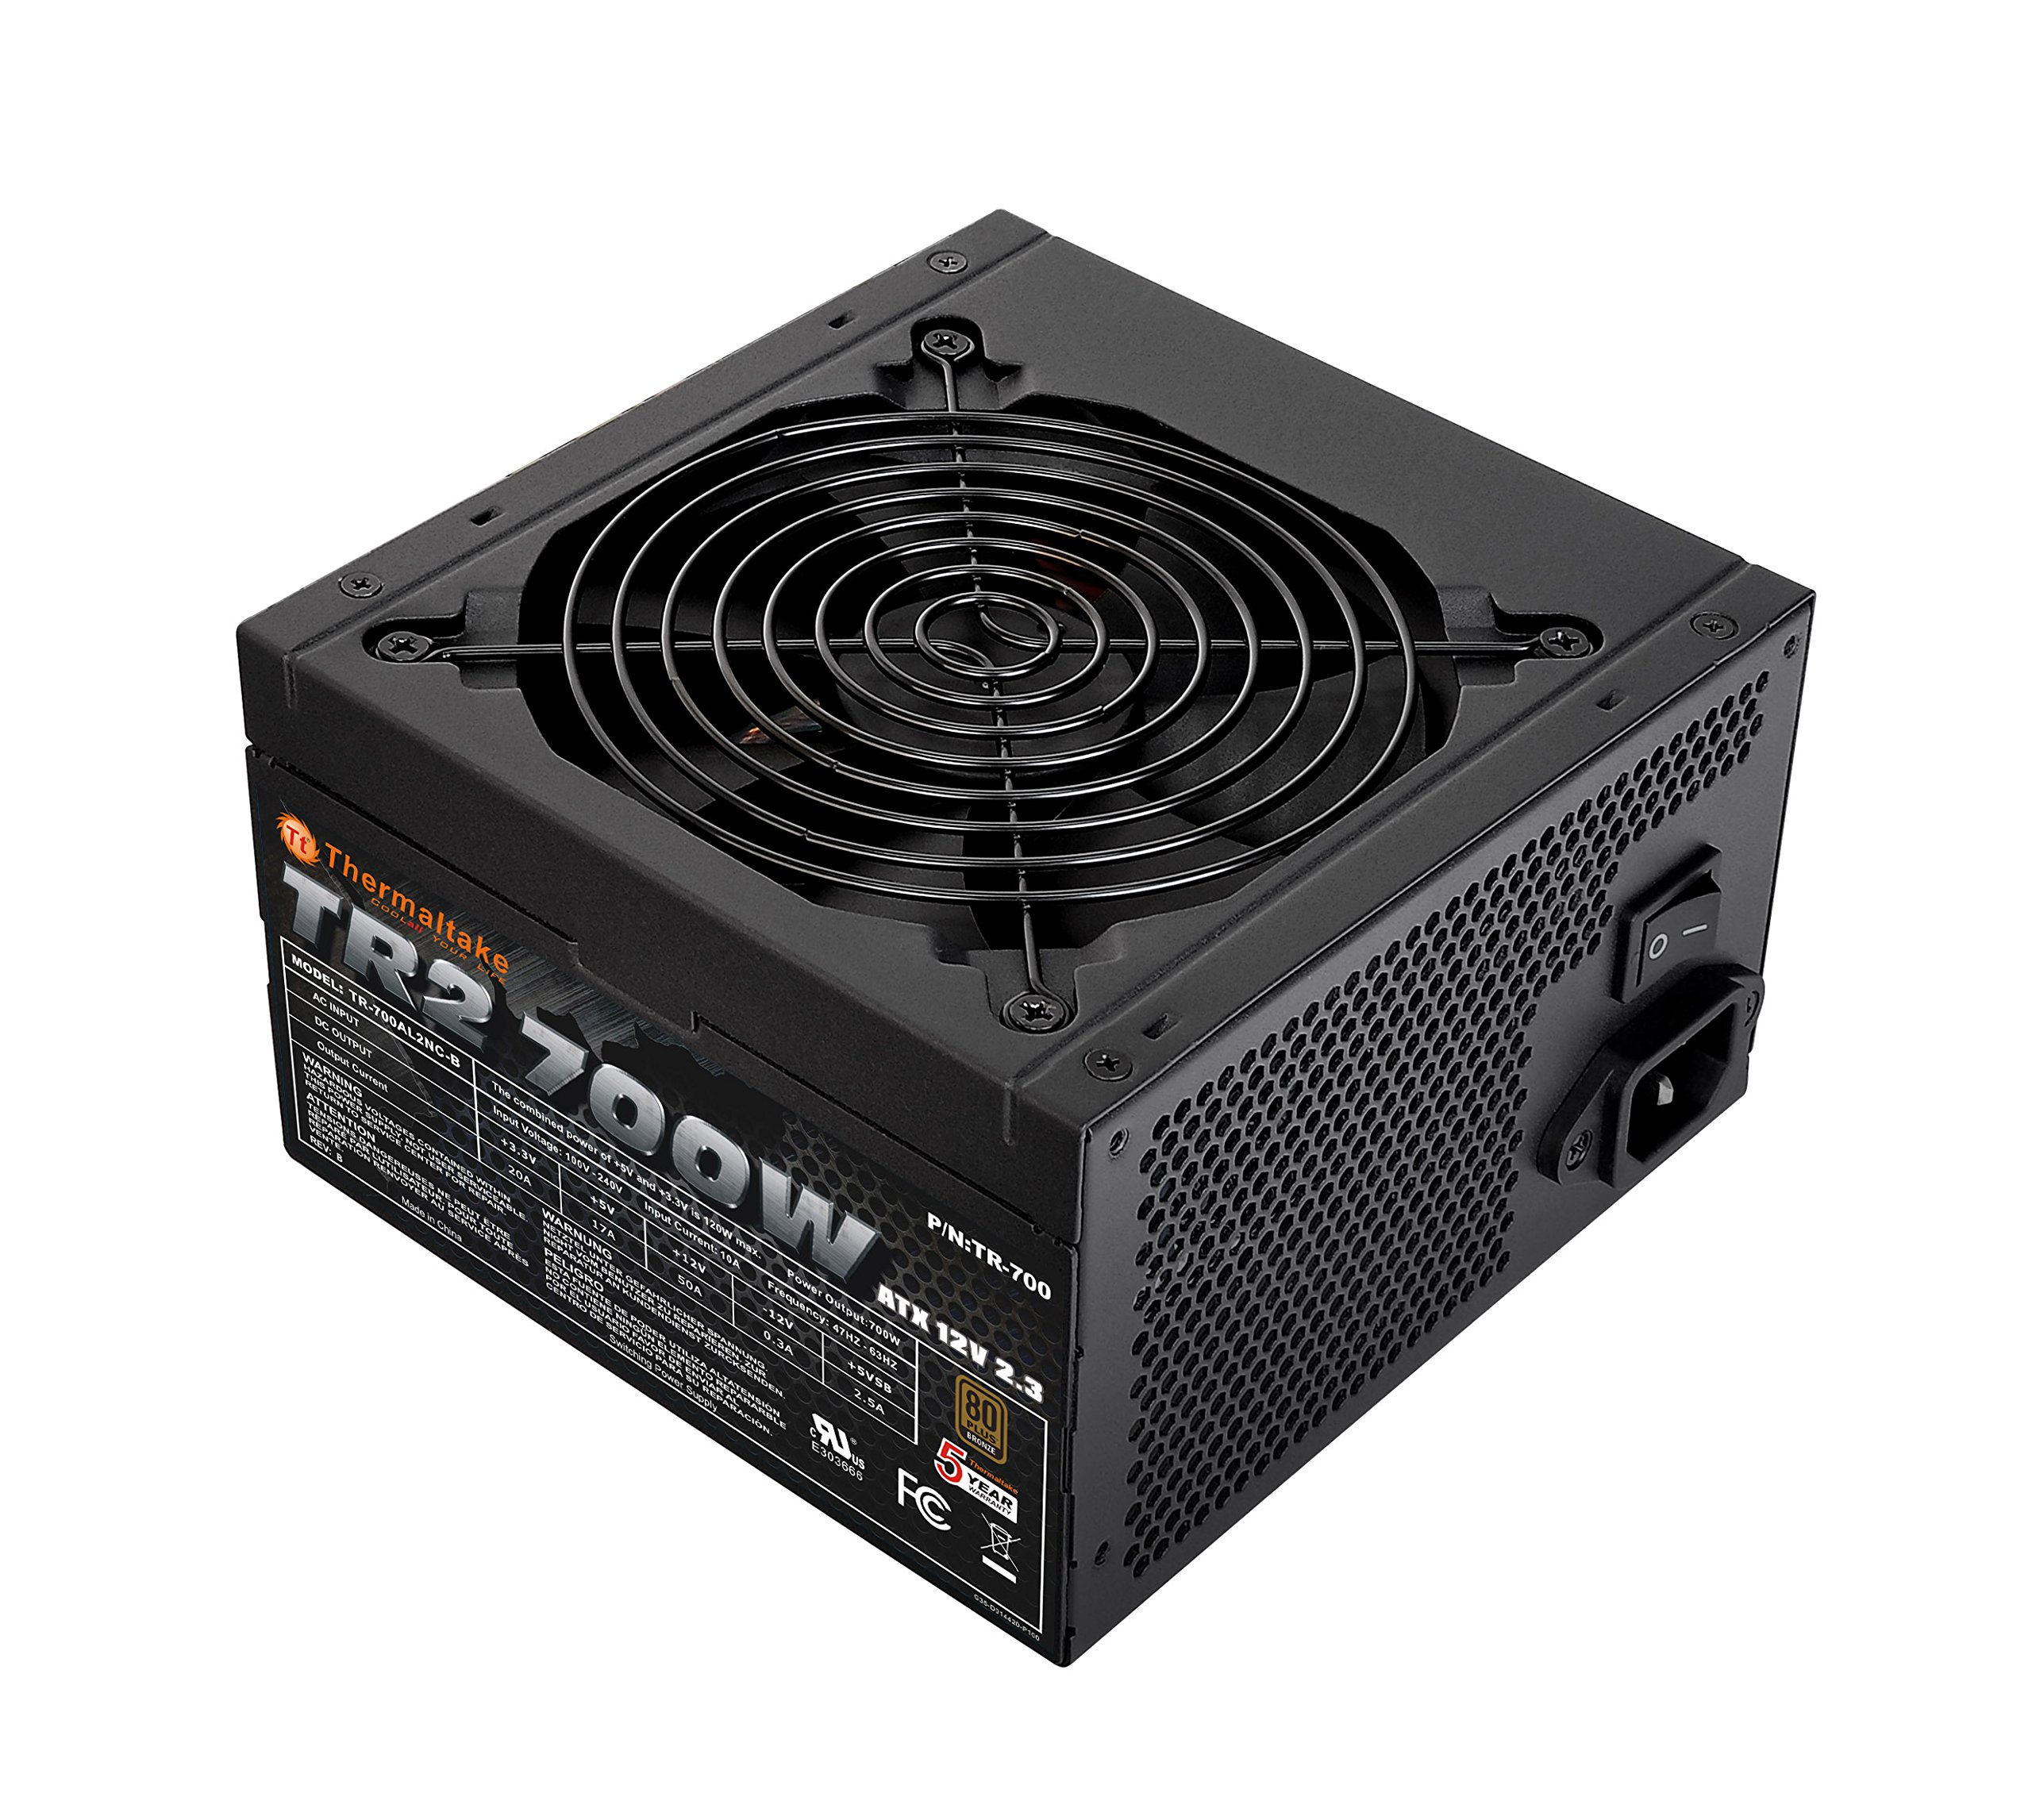 Thermaltake TR2 700W 80+ Bronze ATX 12V 2.4/EPS 12V 2.92 Power Supply TR-700CNUS